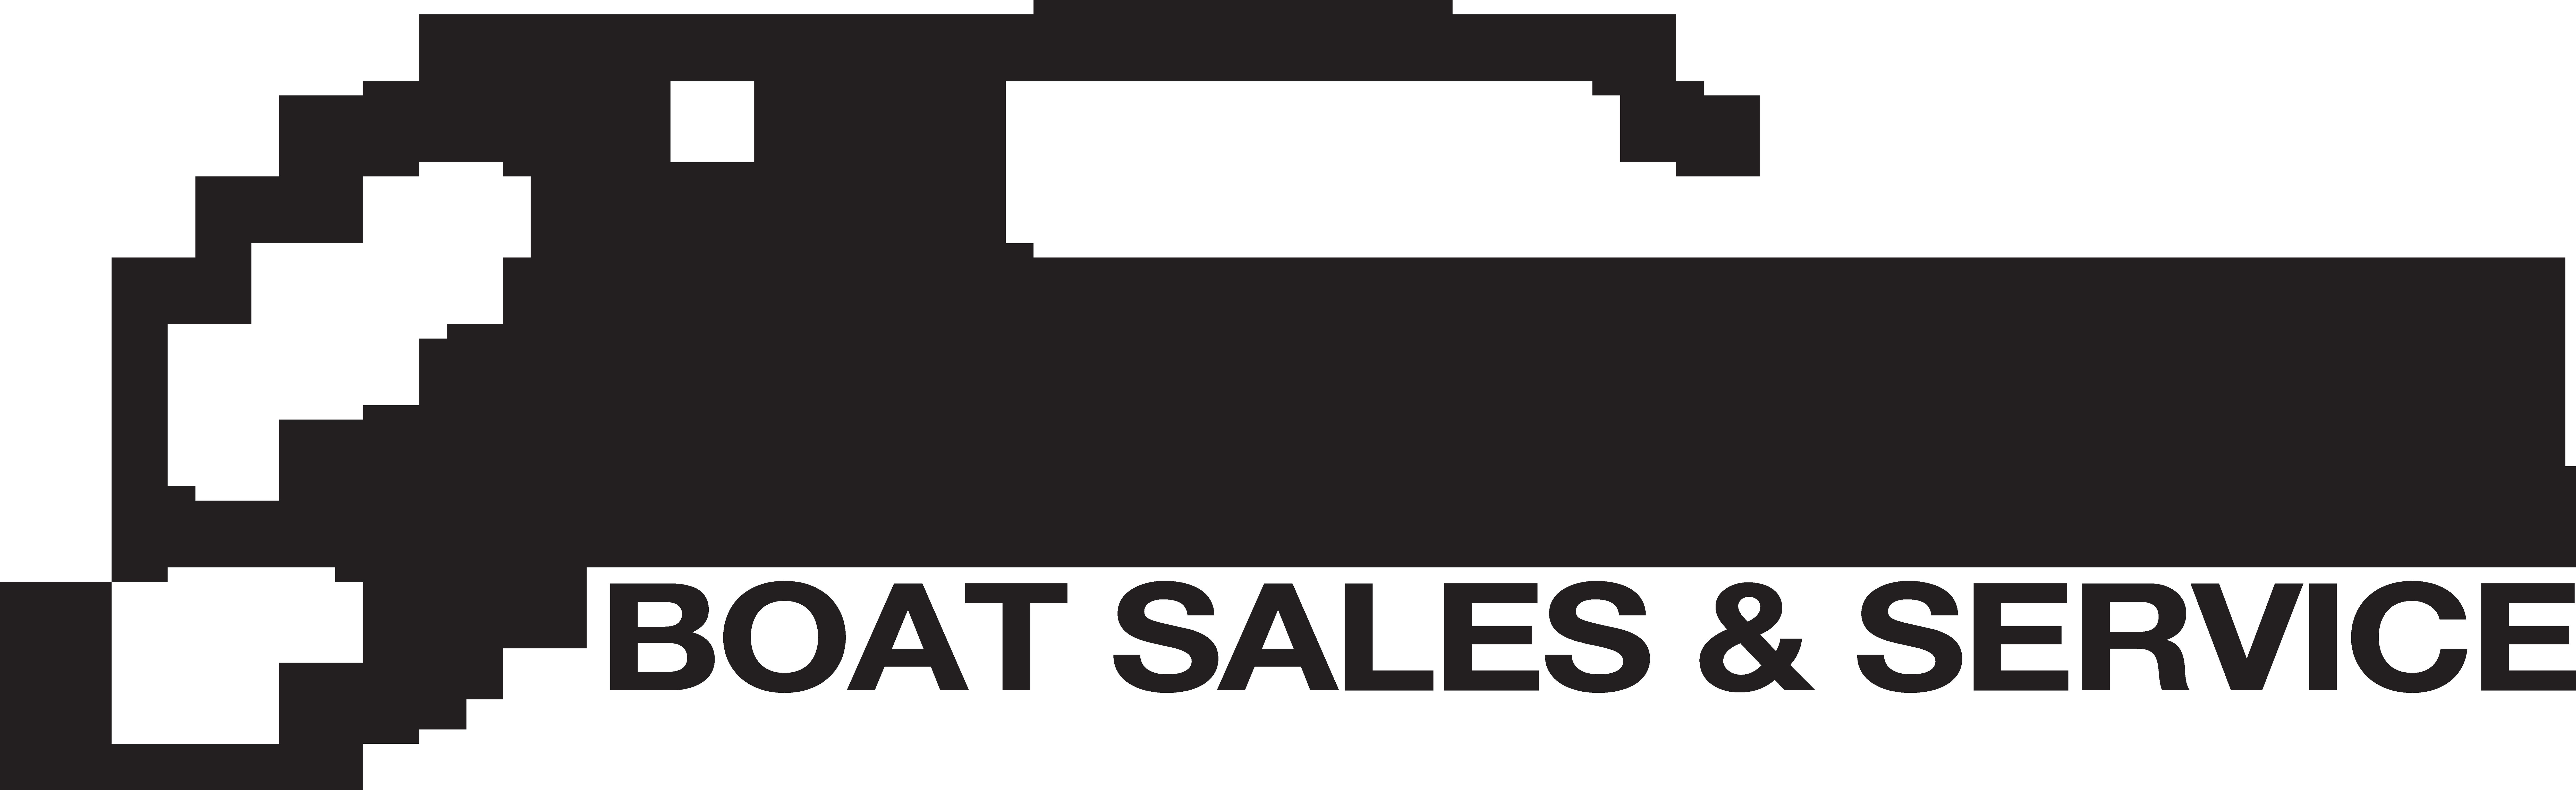 https://growthzonesitesprod.azureedge.net/wp-content/uploads/sites/969/2021/04/Premier-Boat-Sales-Service.png